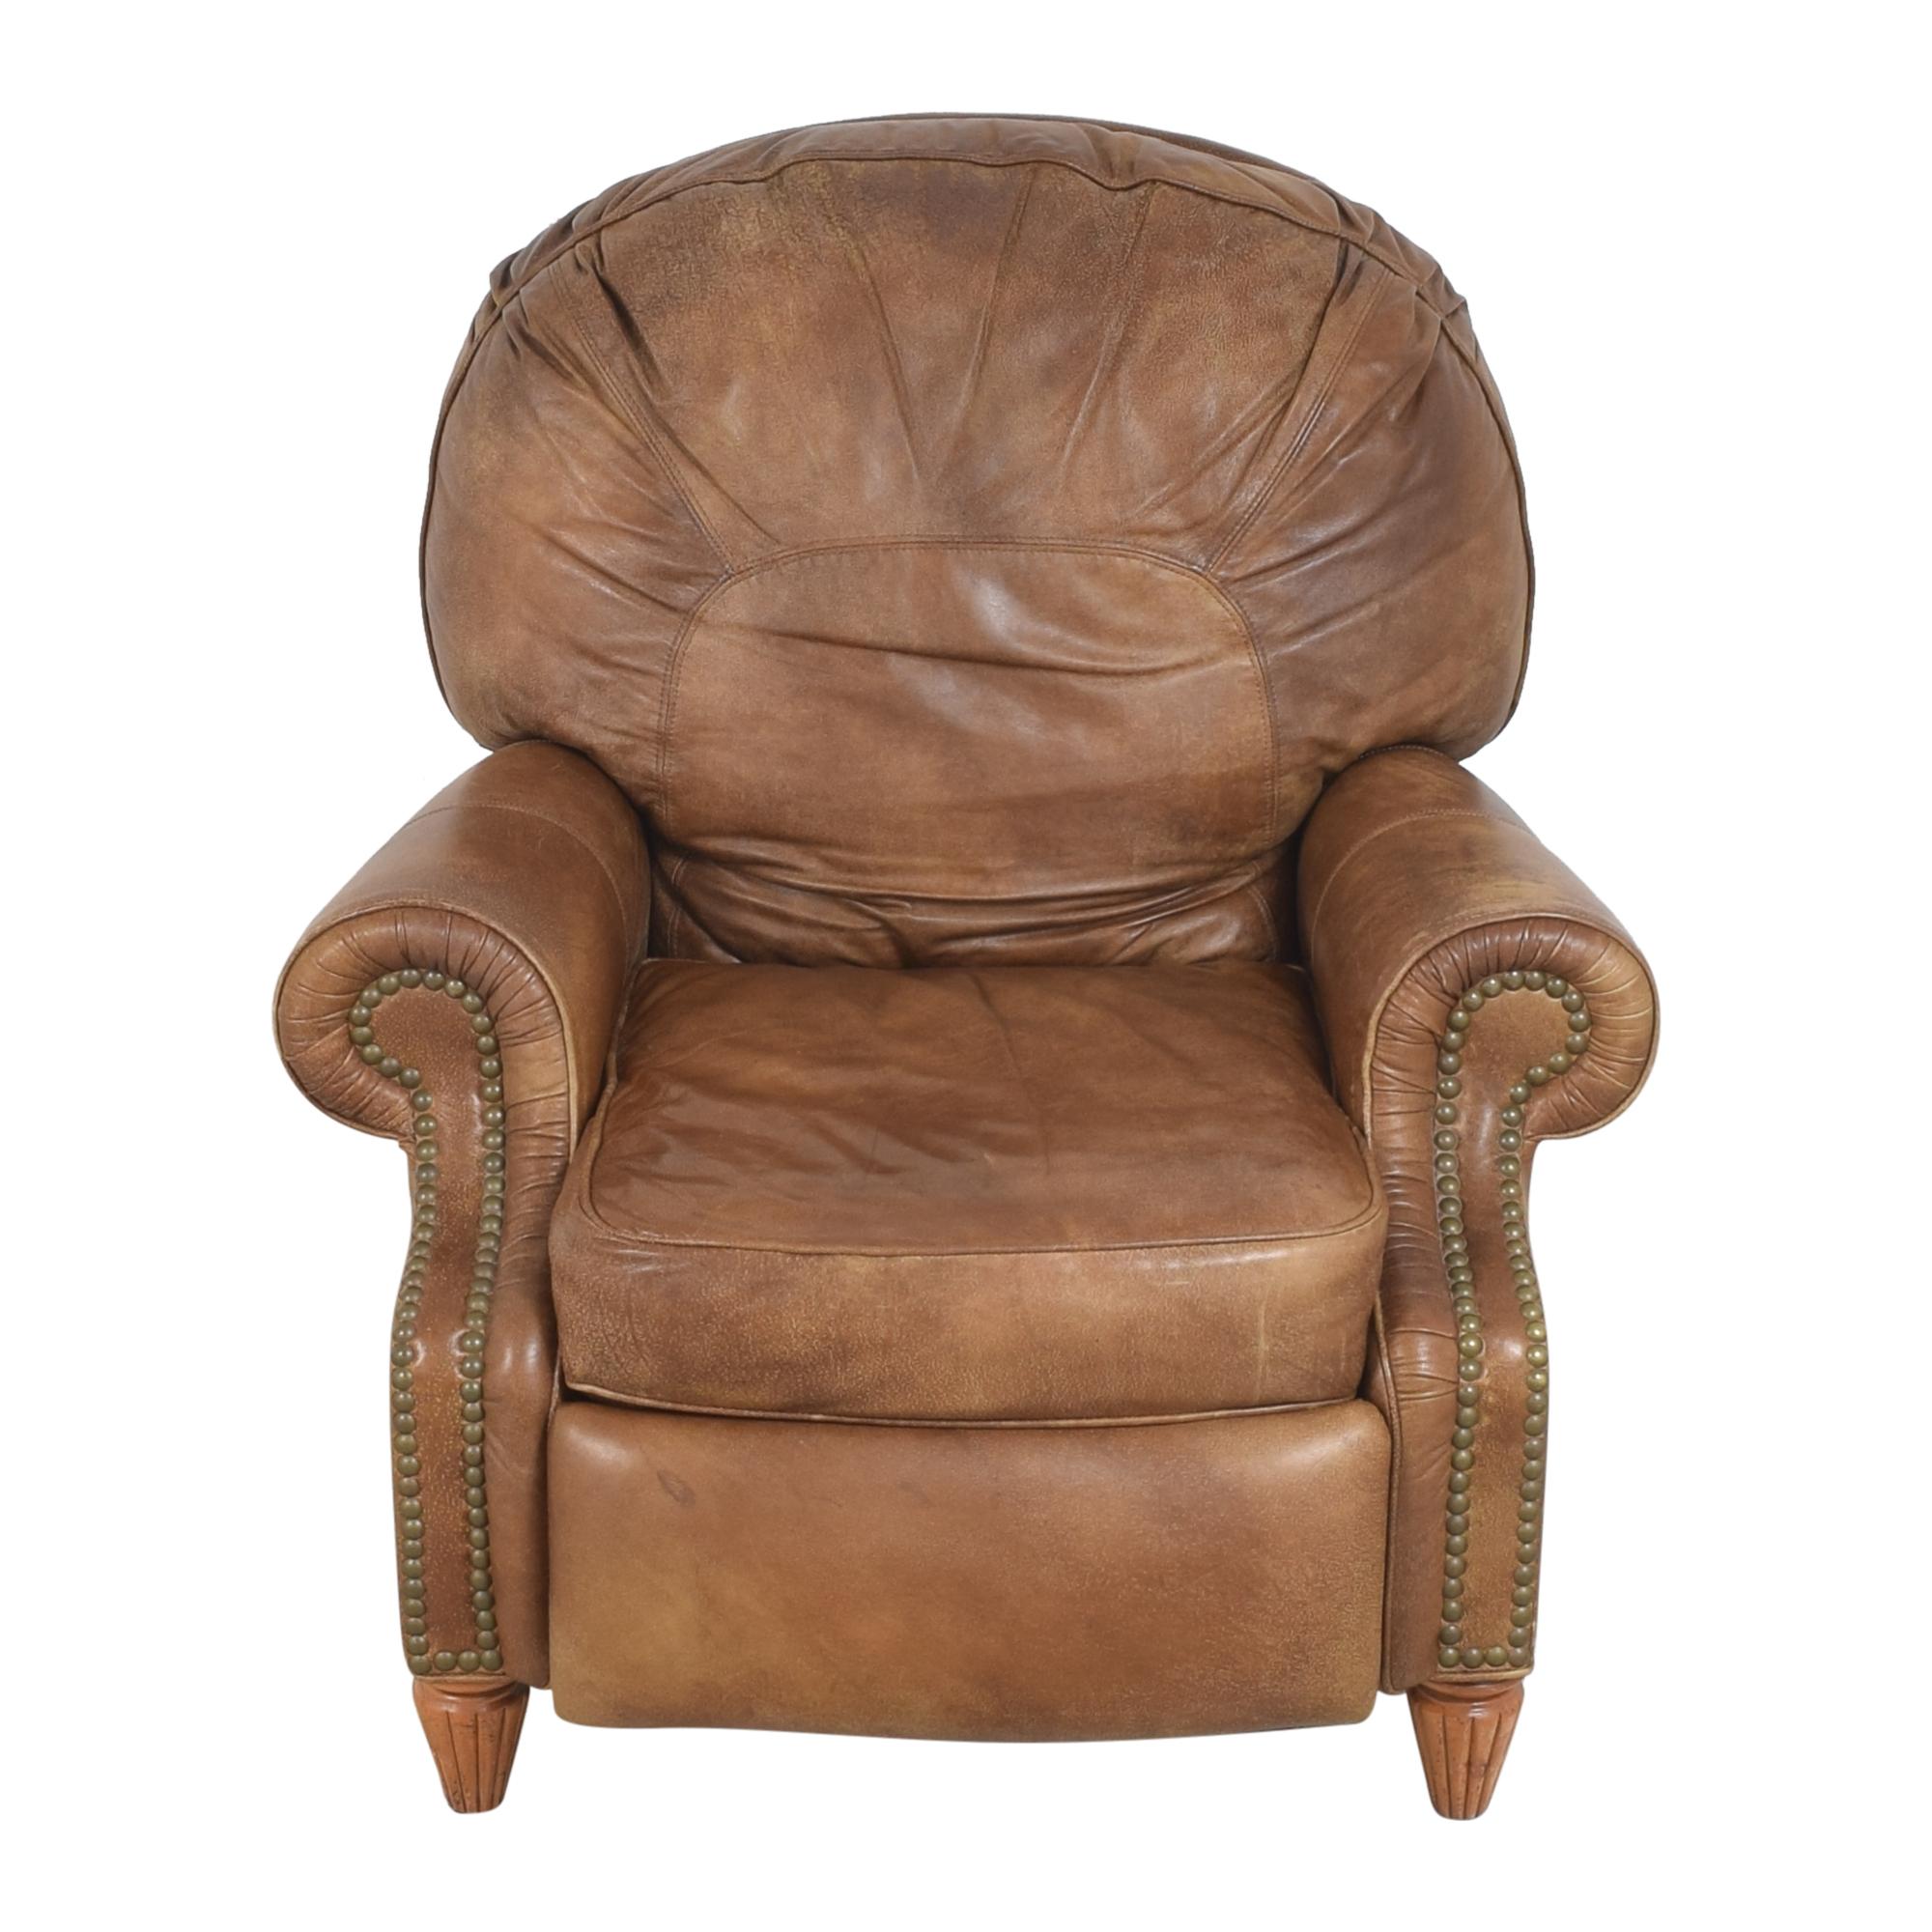 buy Thomasville Leather Morgan Recliner Thomasville